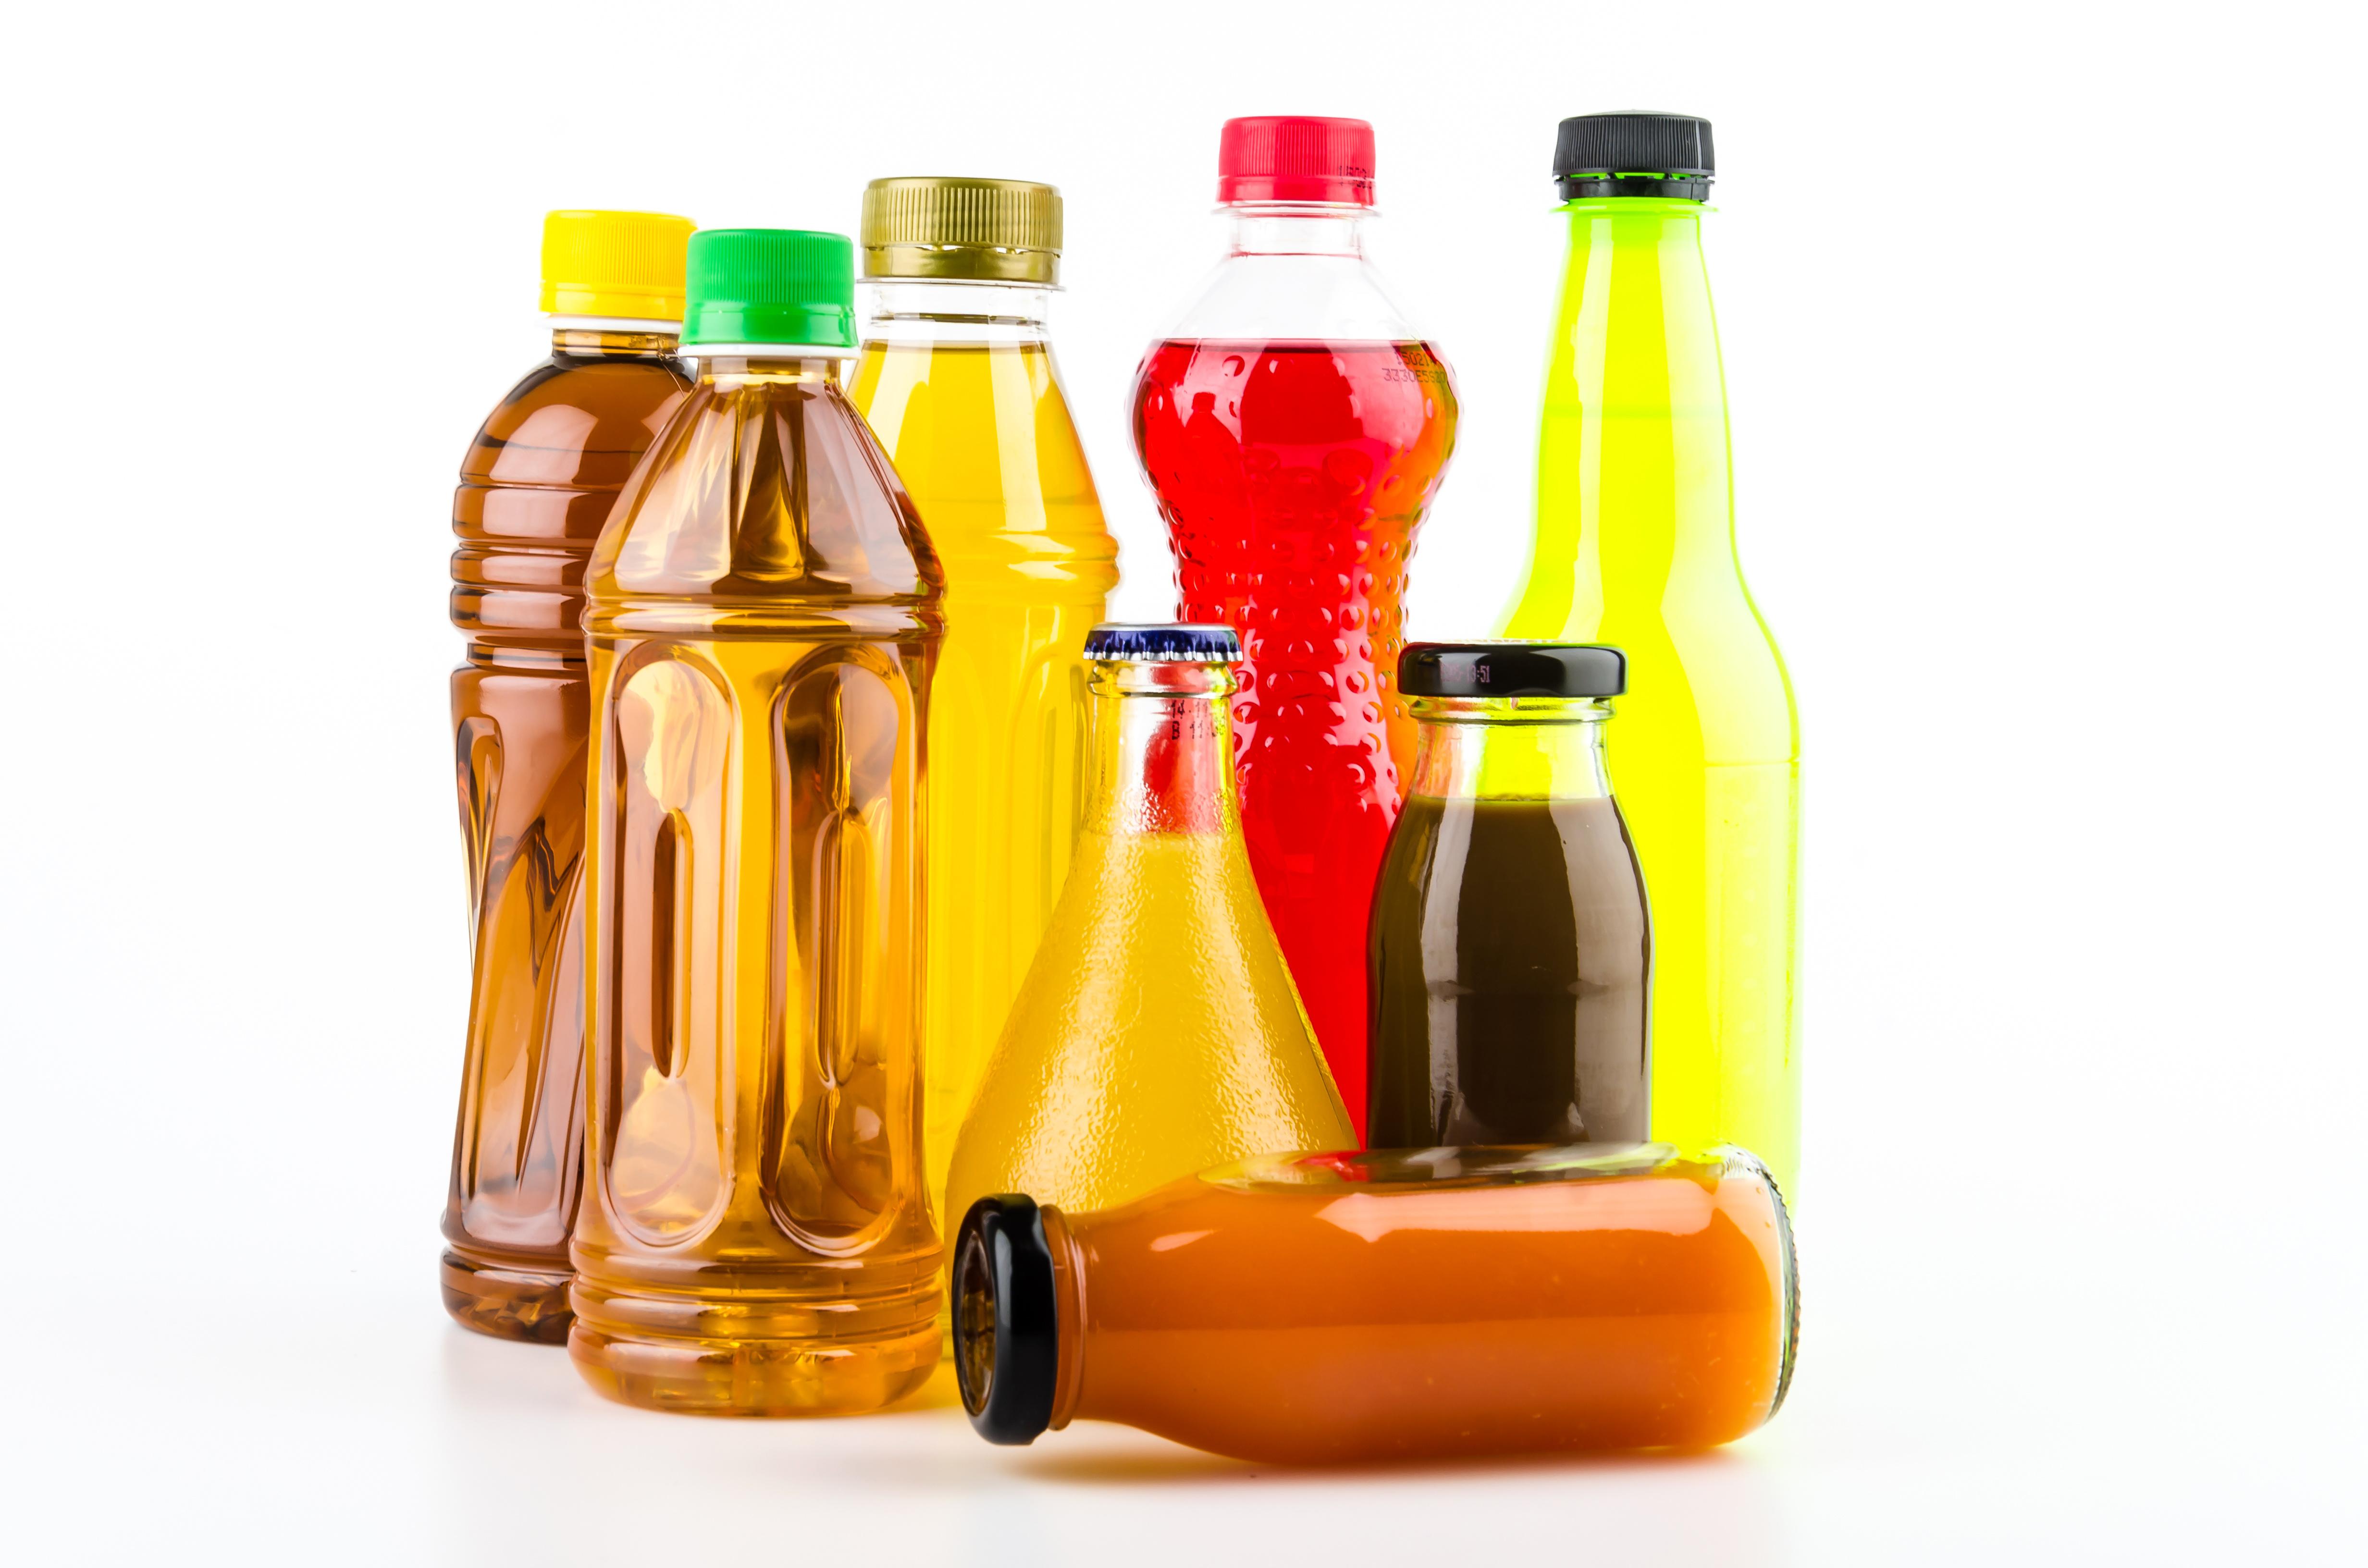 beverages many phosphorus hidden kidney bottled national drinks sky food foundation assorted diseases patients risk according letter journal research published